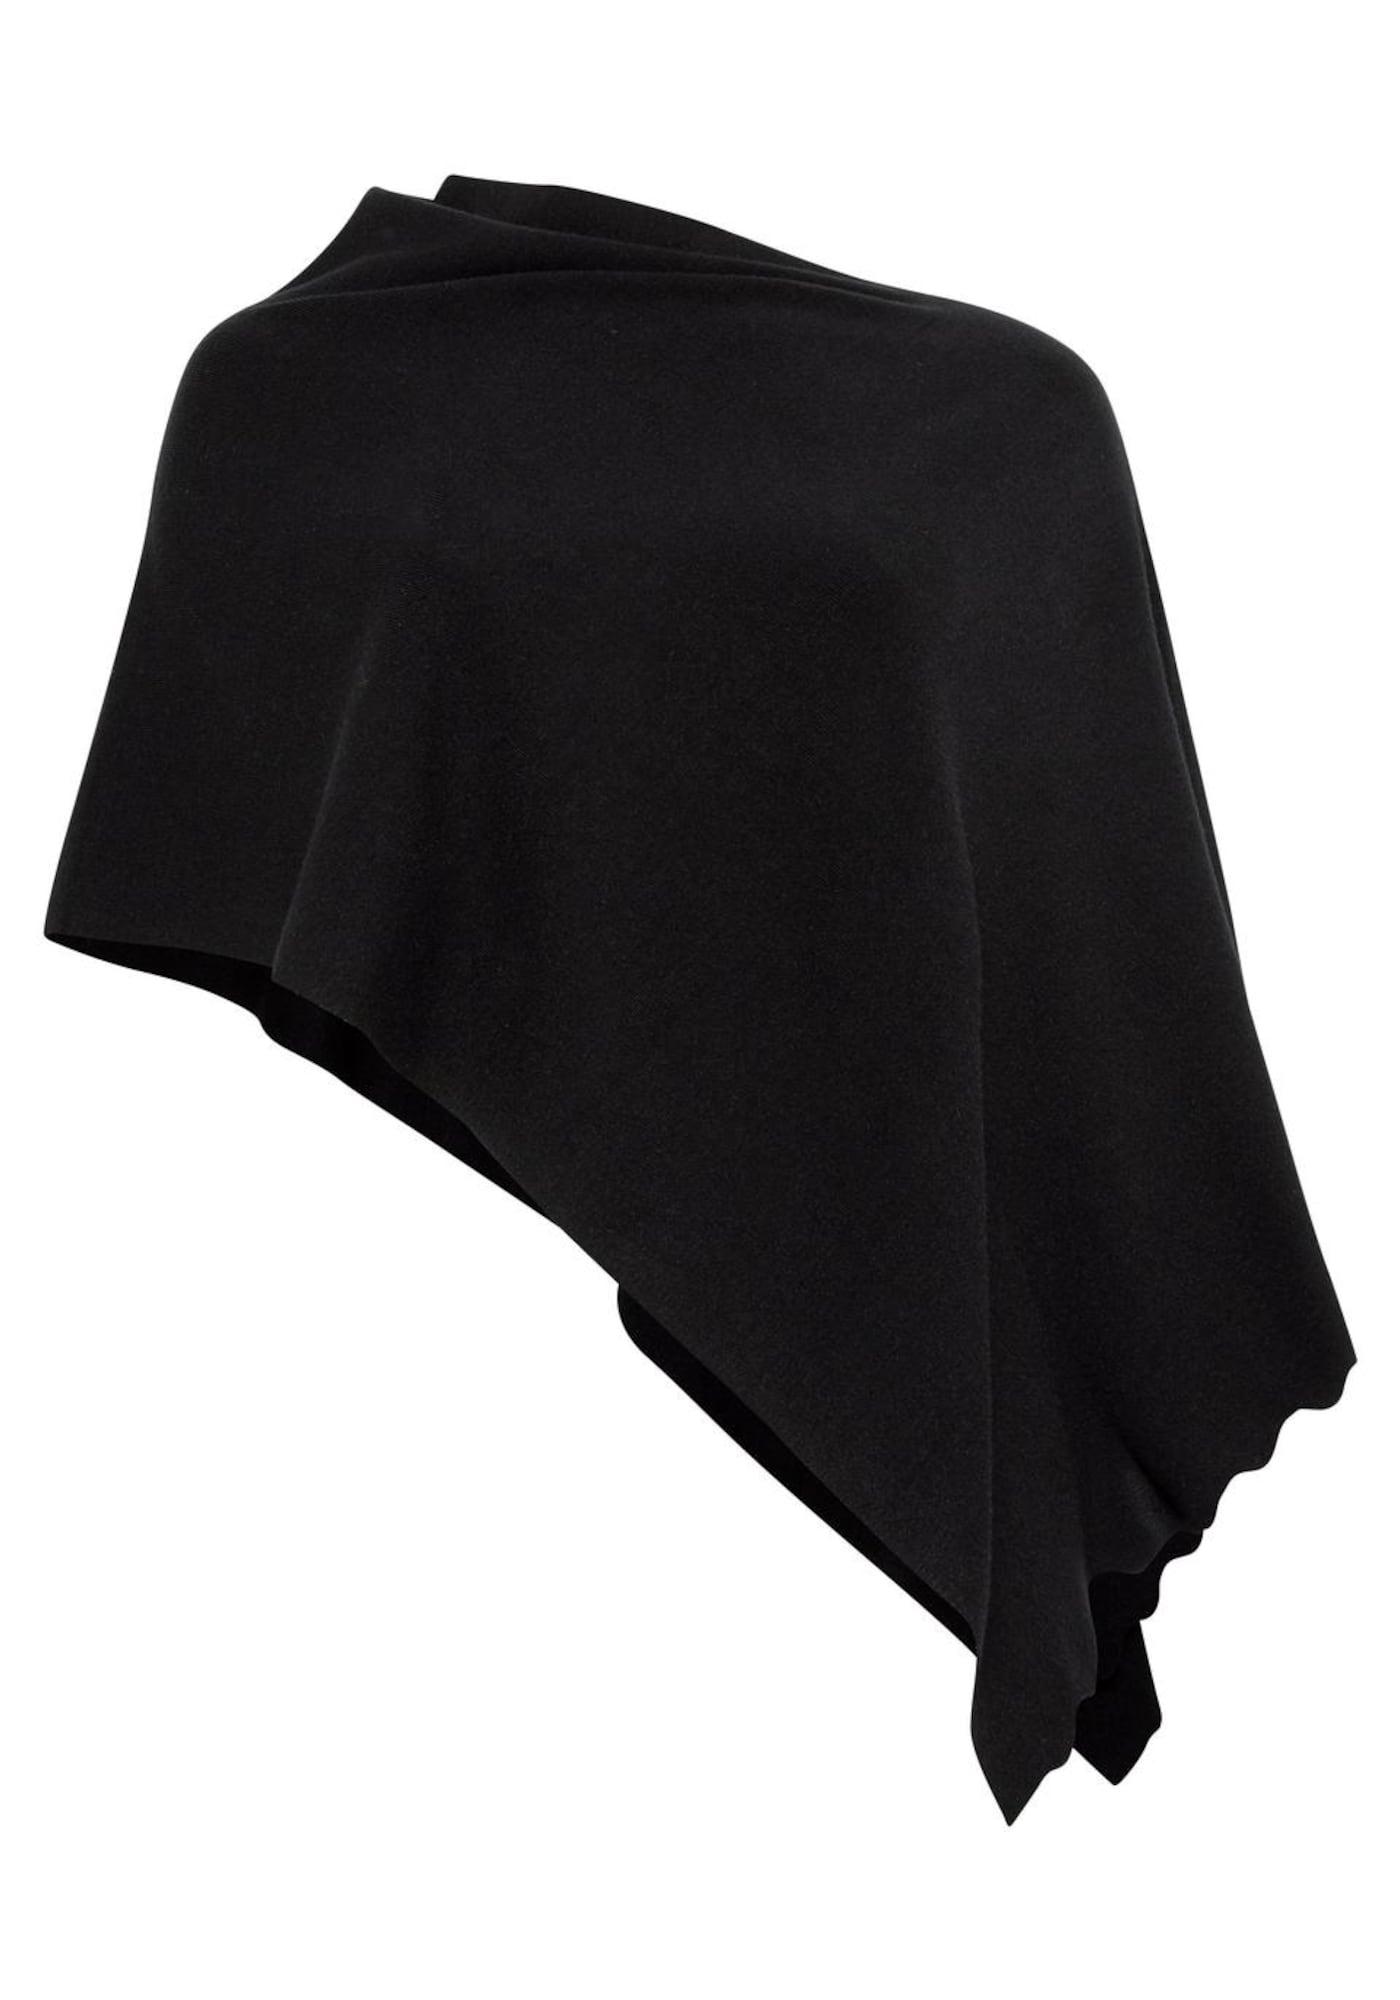 Strickponcho | Bekleidung > Pullover > Ponchos & Capes | Schwarz | SHEEGO